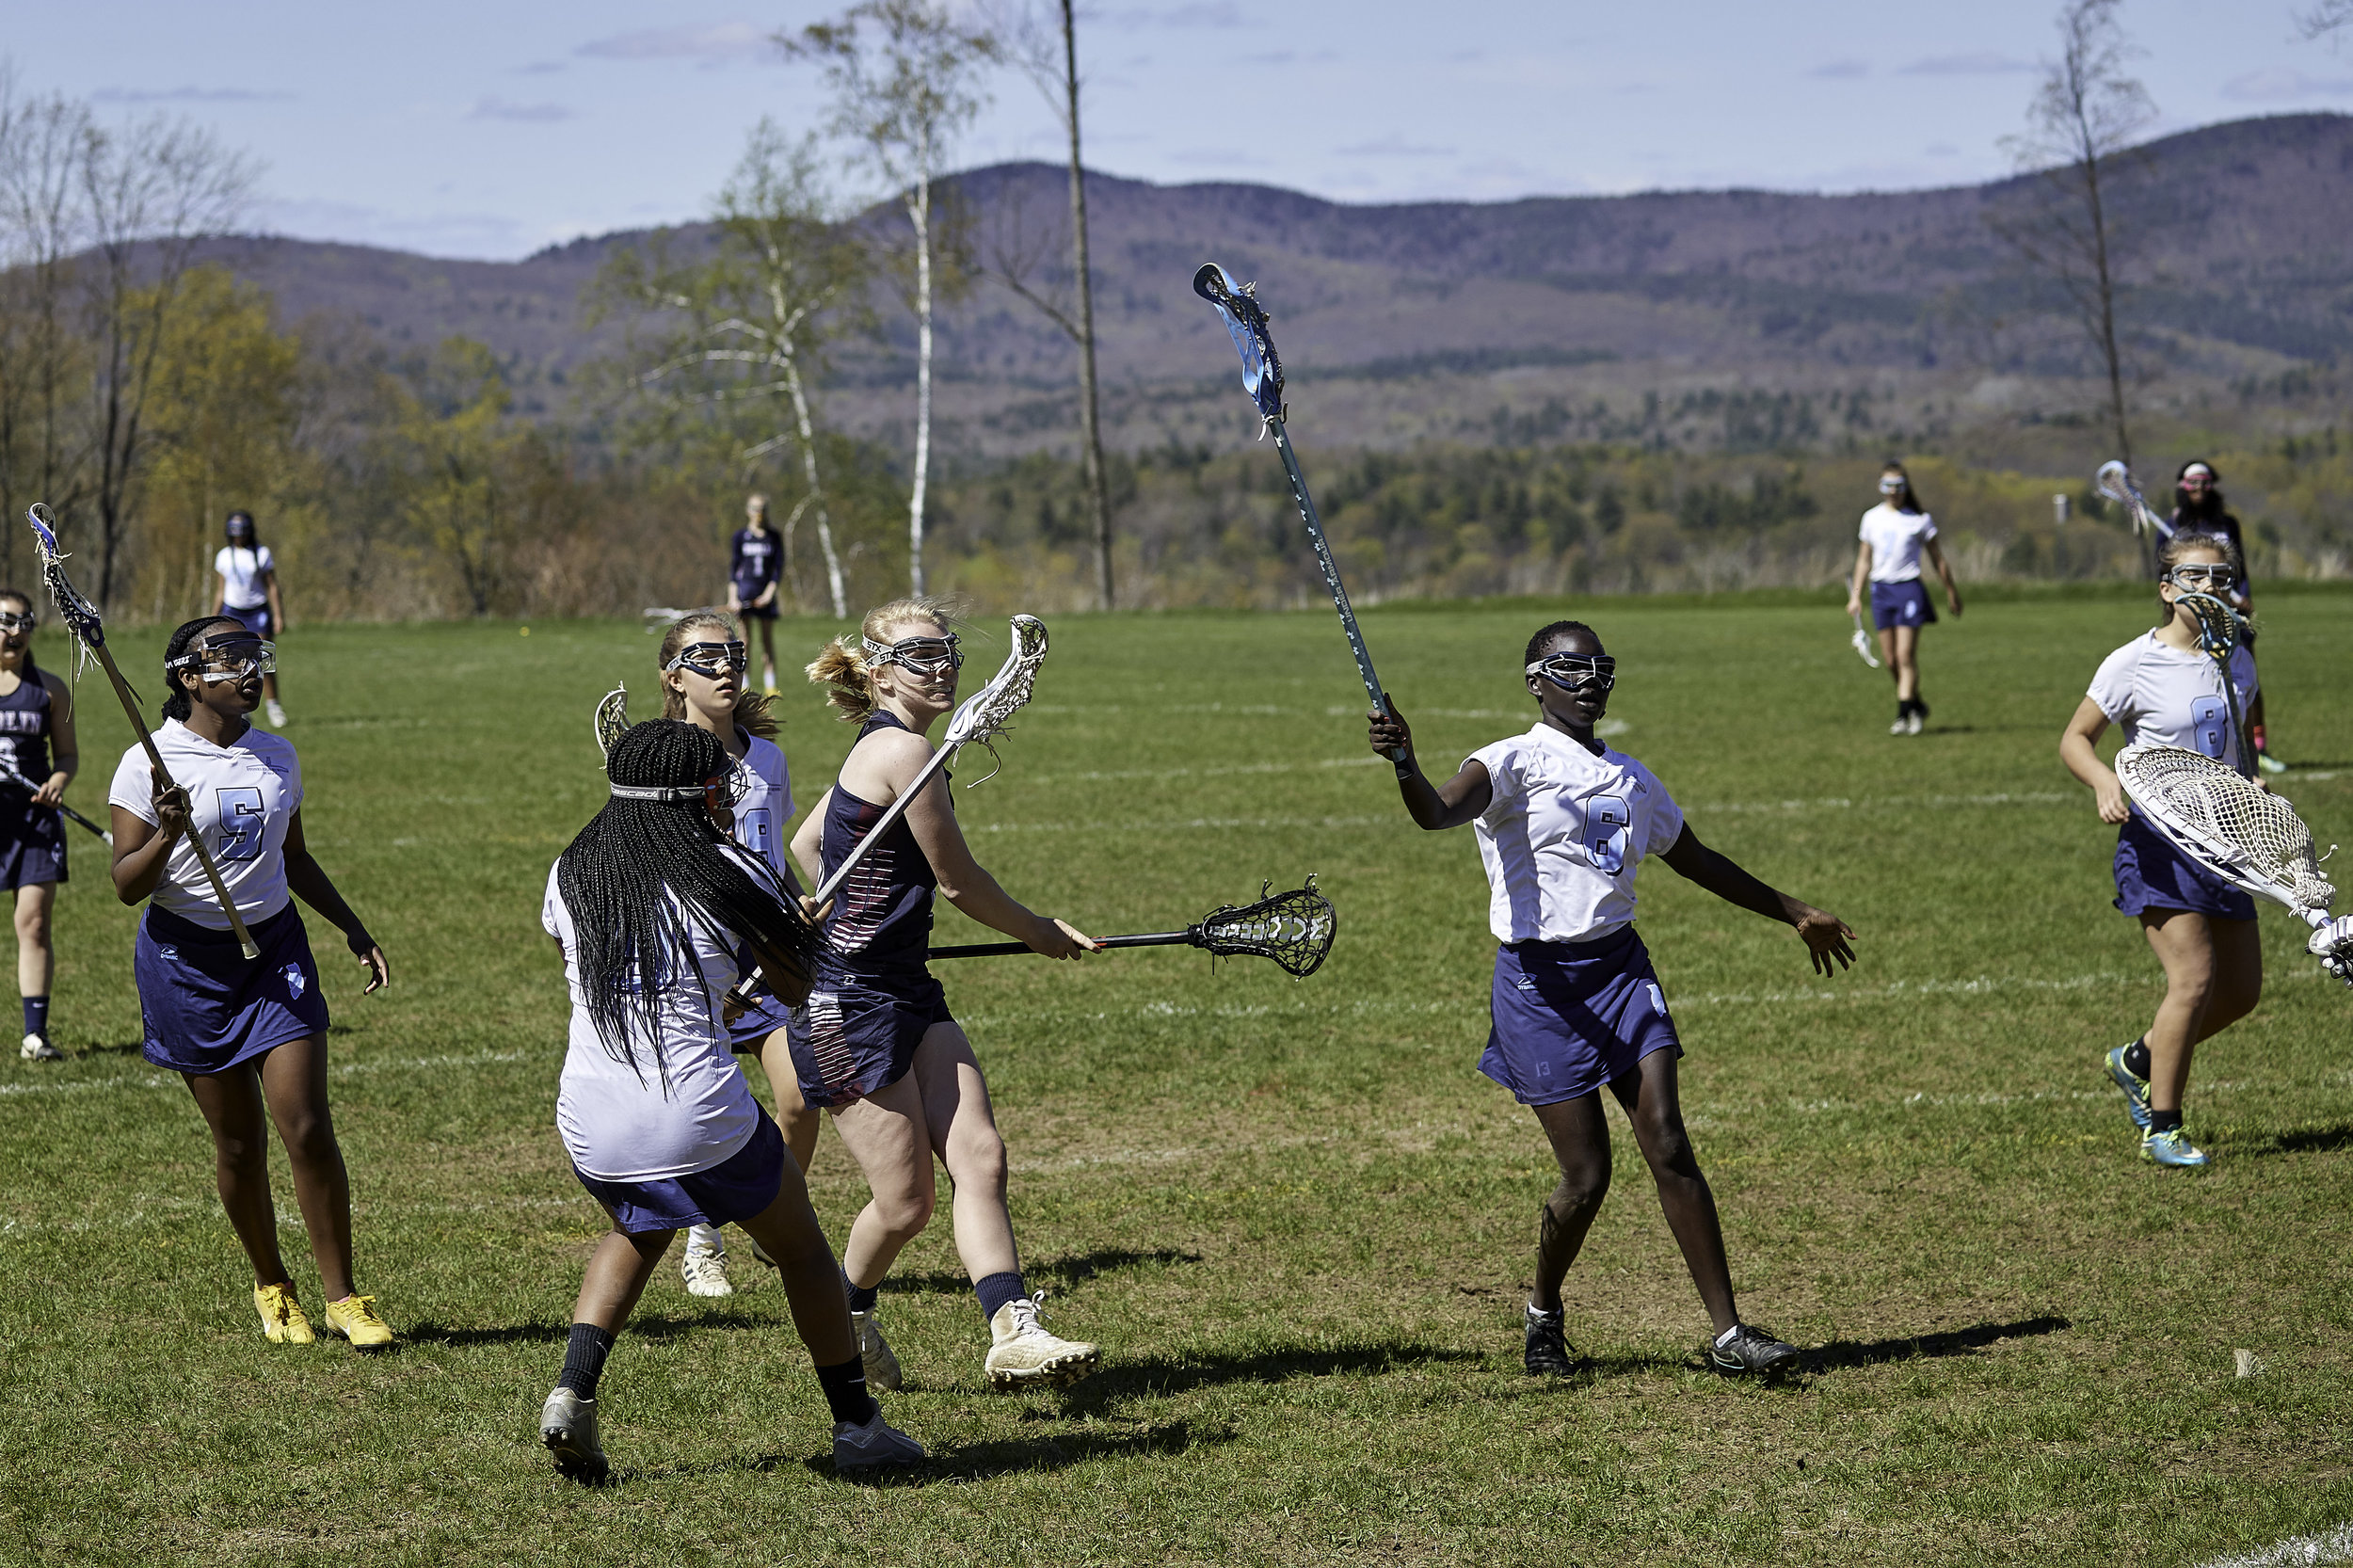 Girls Lacrosse vs. Stoneleigh Burnham School - May 11, 2019 - May 10, 2019193432.jpg